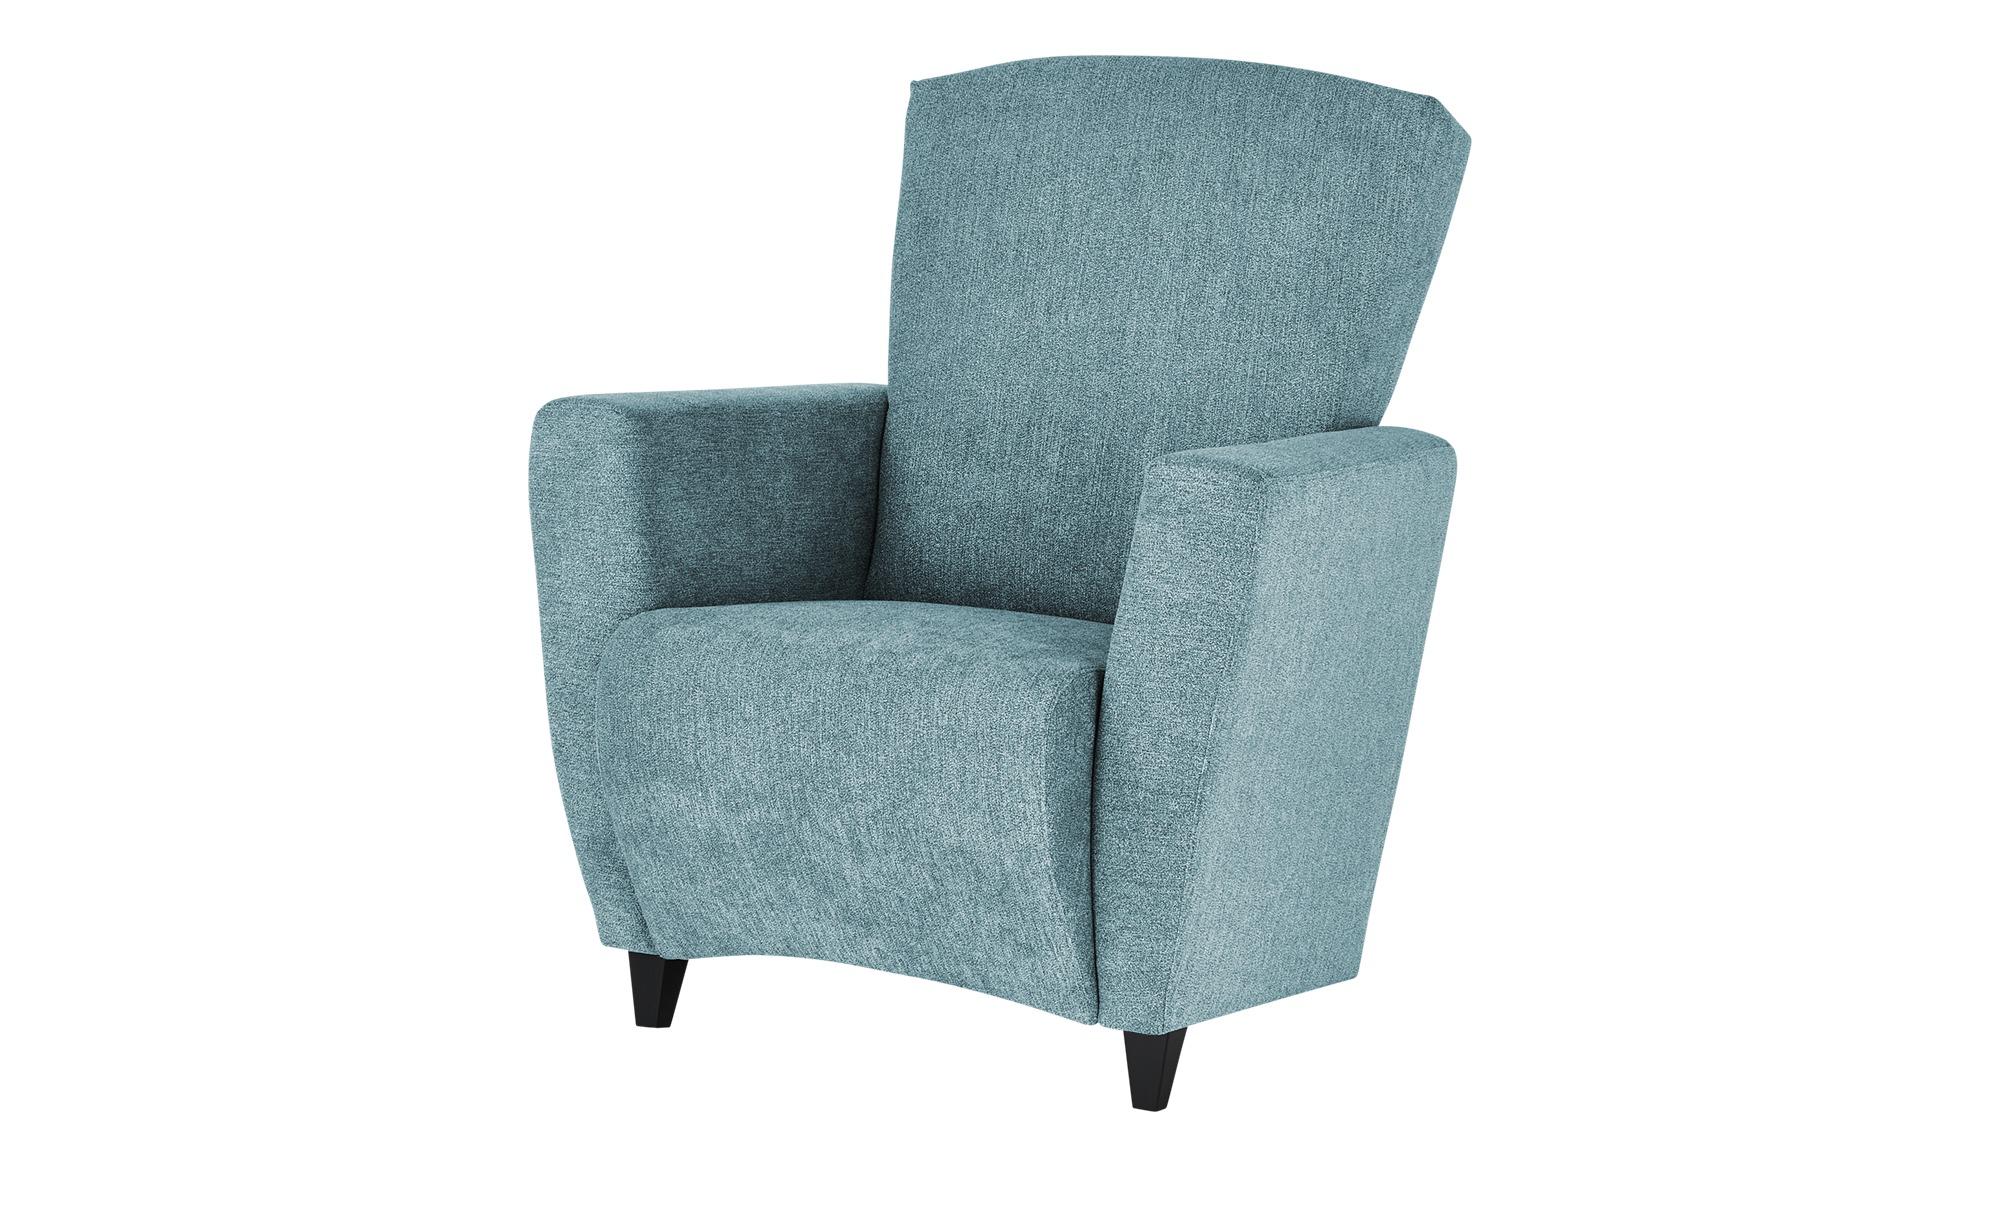 smart Sessel  Alma ¦ blau ¦ Maße (cm): B: 84 H: 94 T: 80 Polstermöbel > Sessel > Polstersessel - Höffner